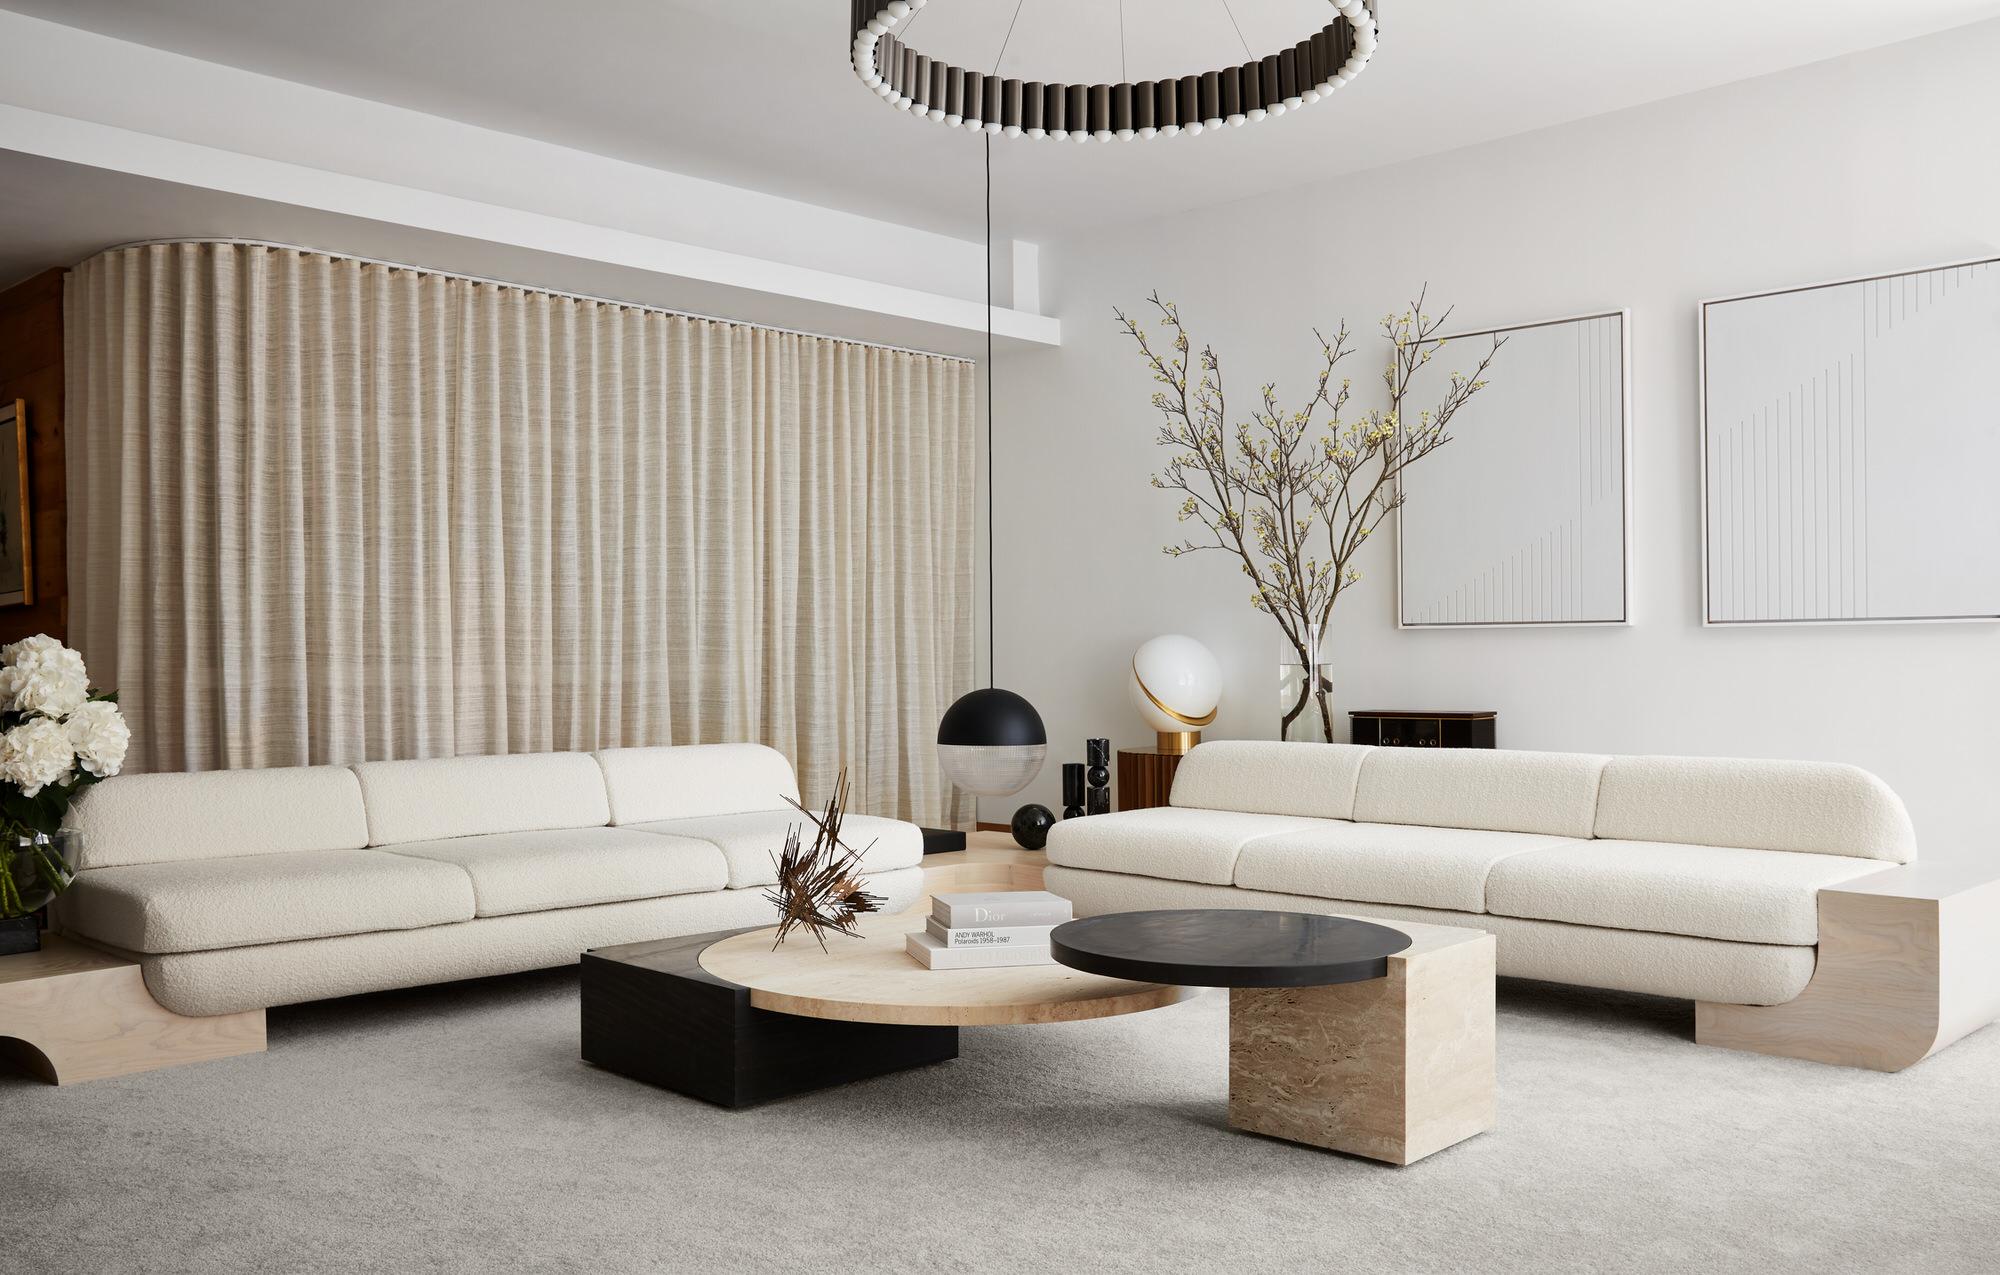 Lee Broom Penthouse New York Living Room Photo Stephen Kent Johnson Yellowtrace 06